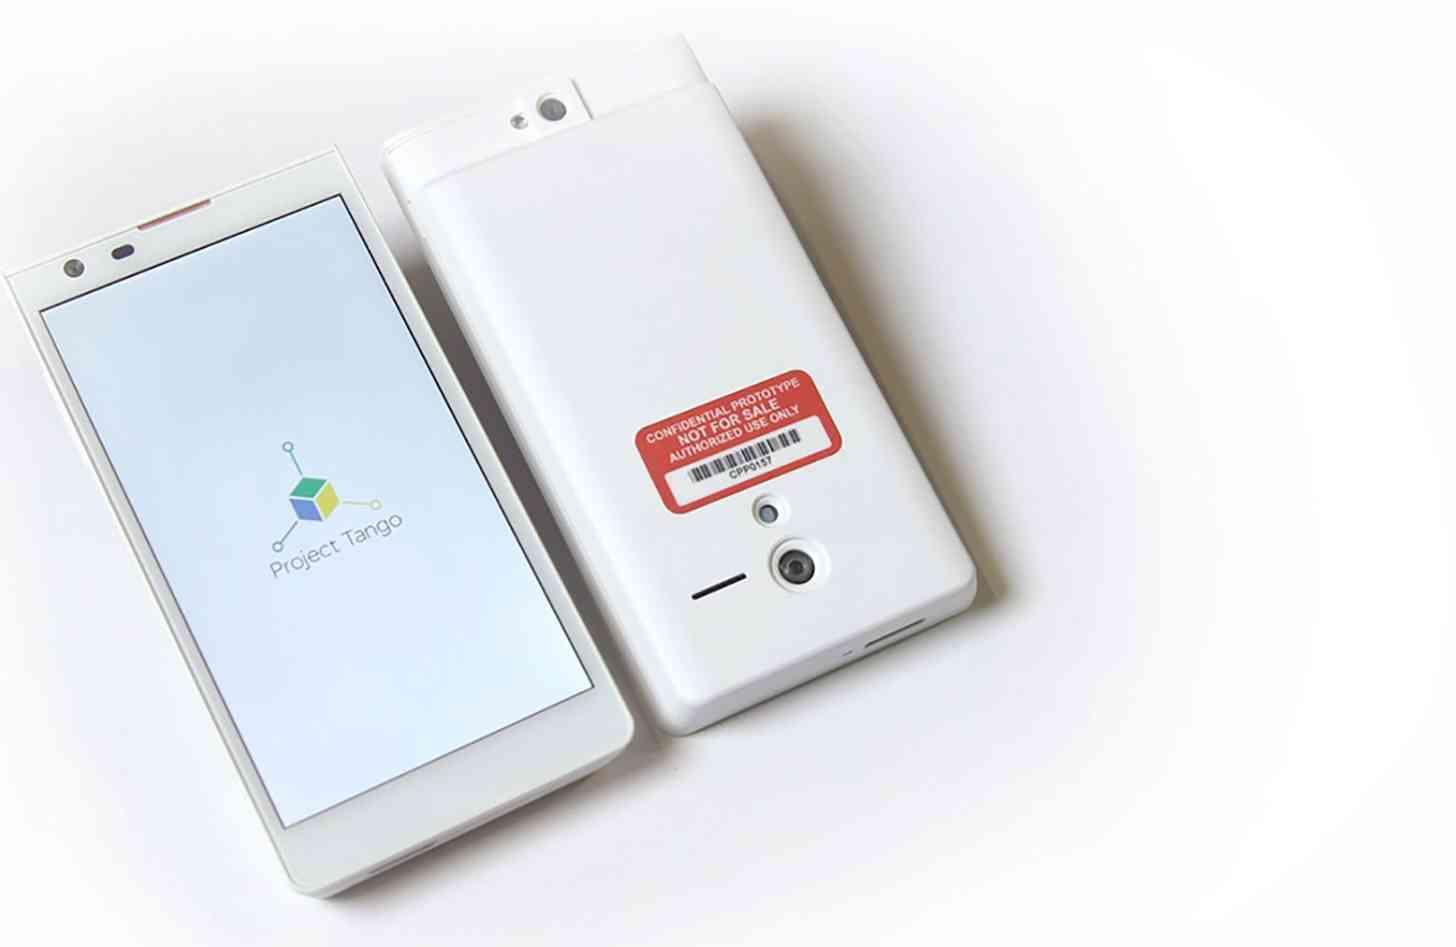 Project Tango phone Google